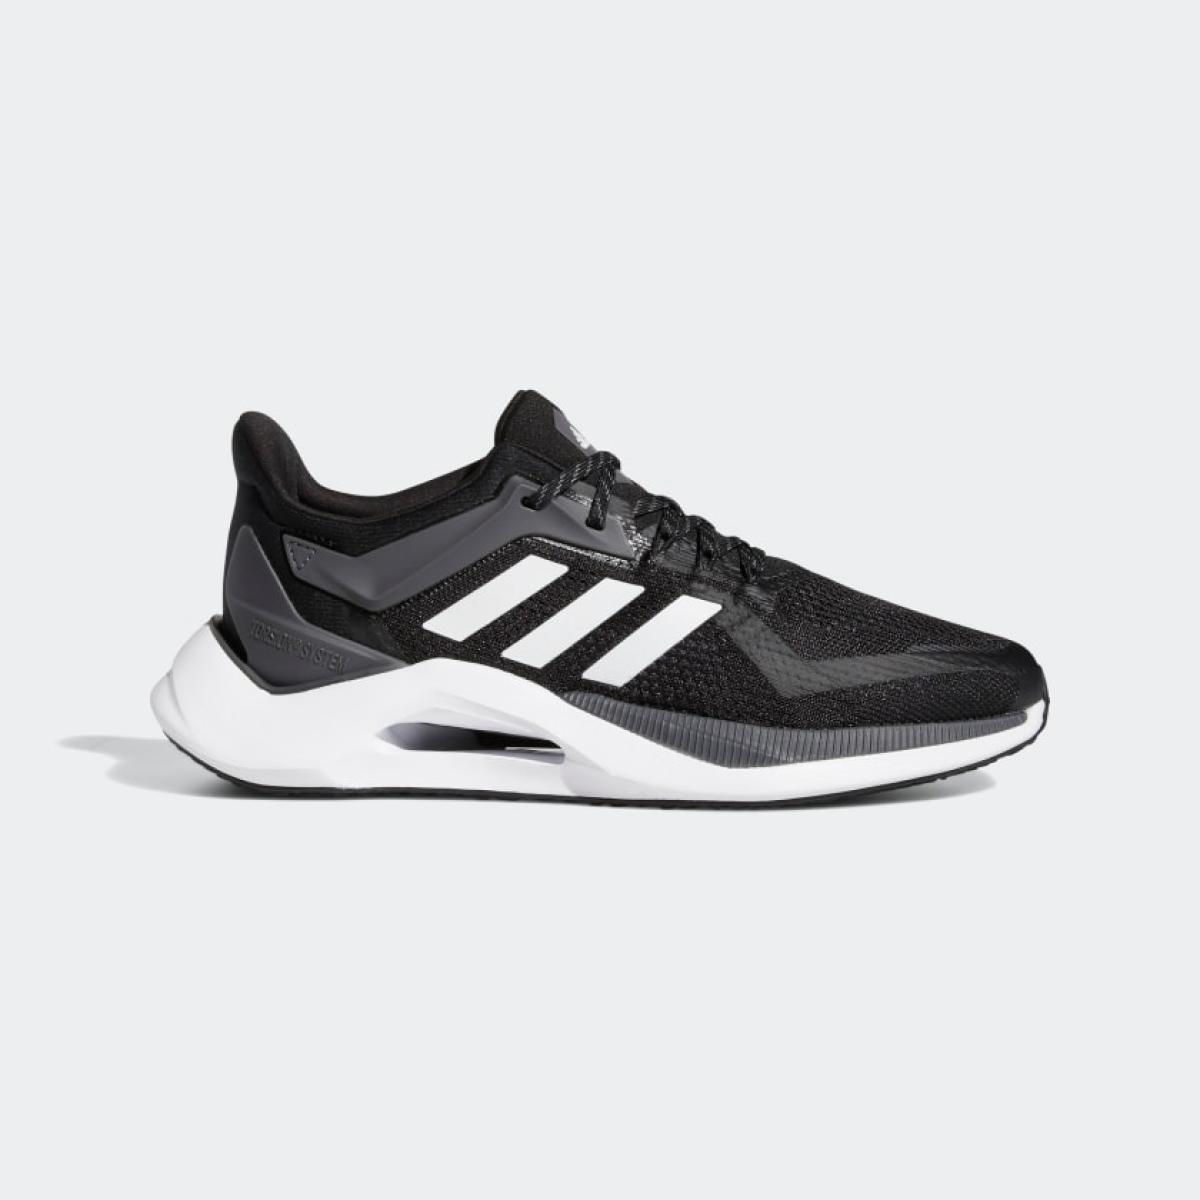 Adidas torsion 2.0